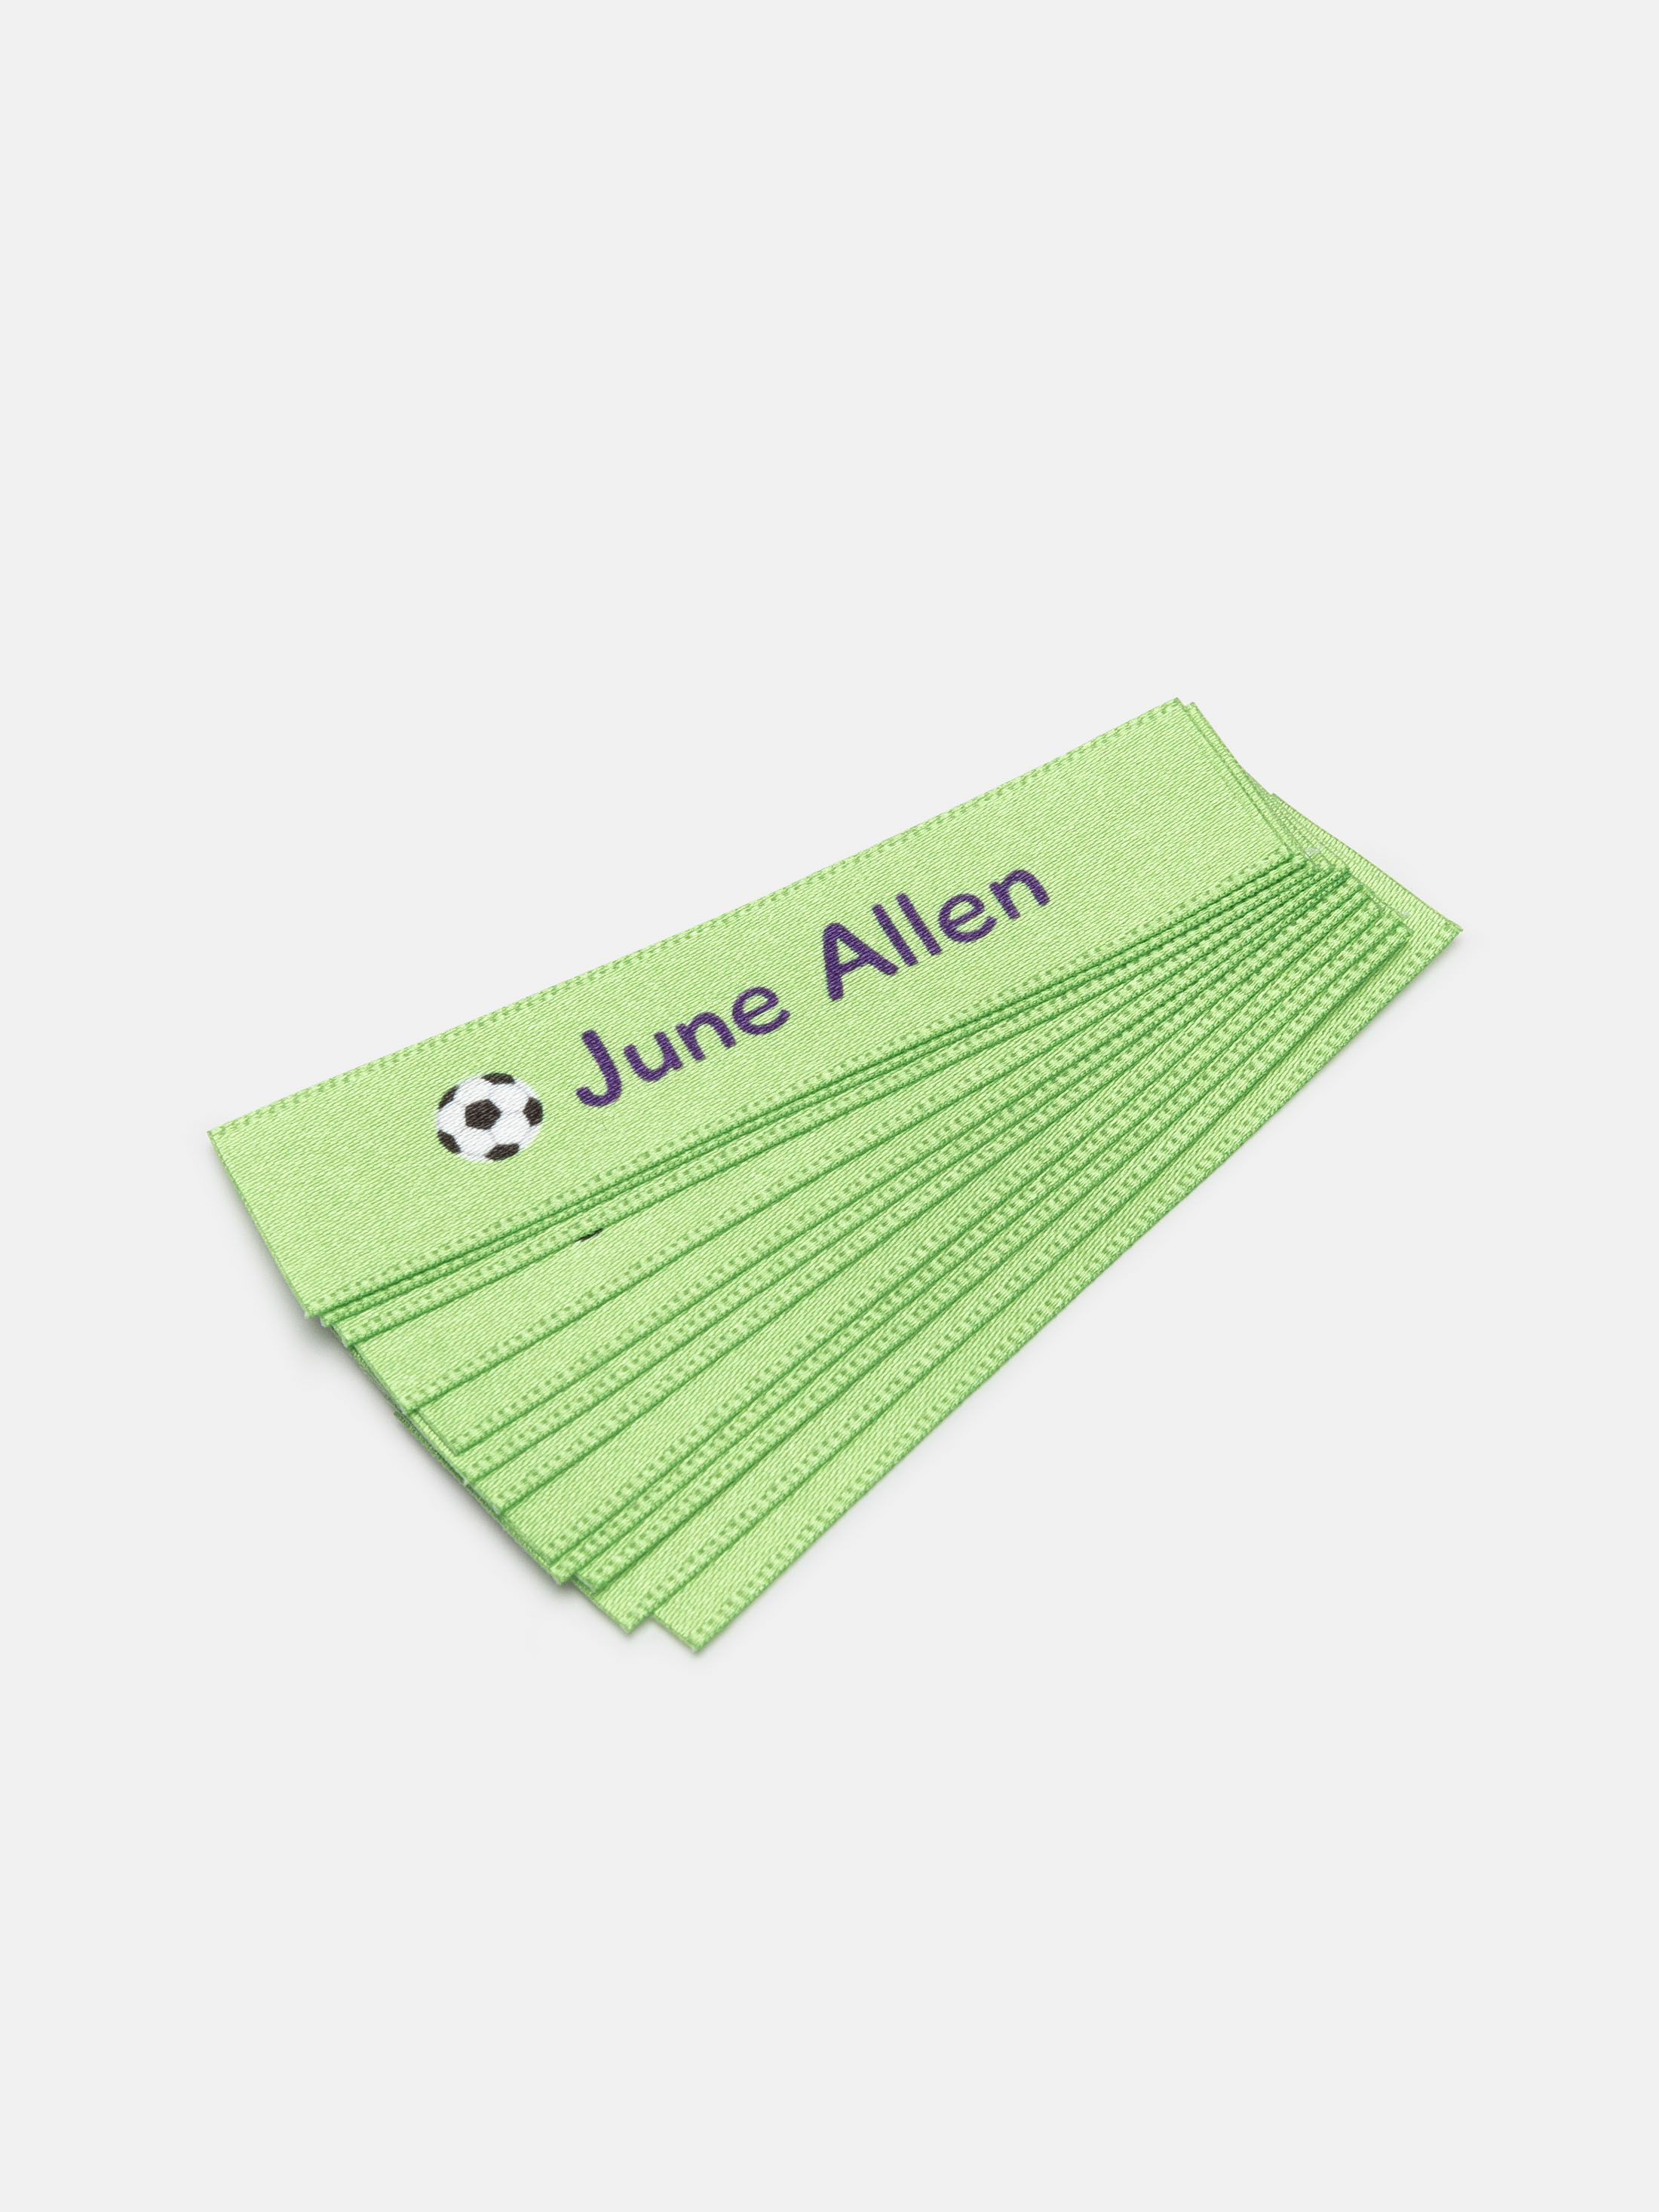 bespoke name labels pack